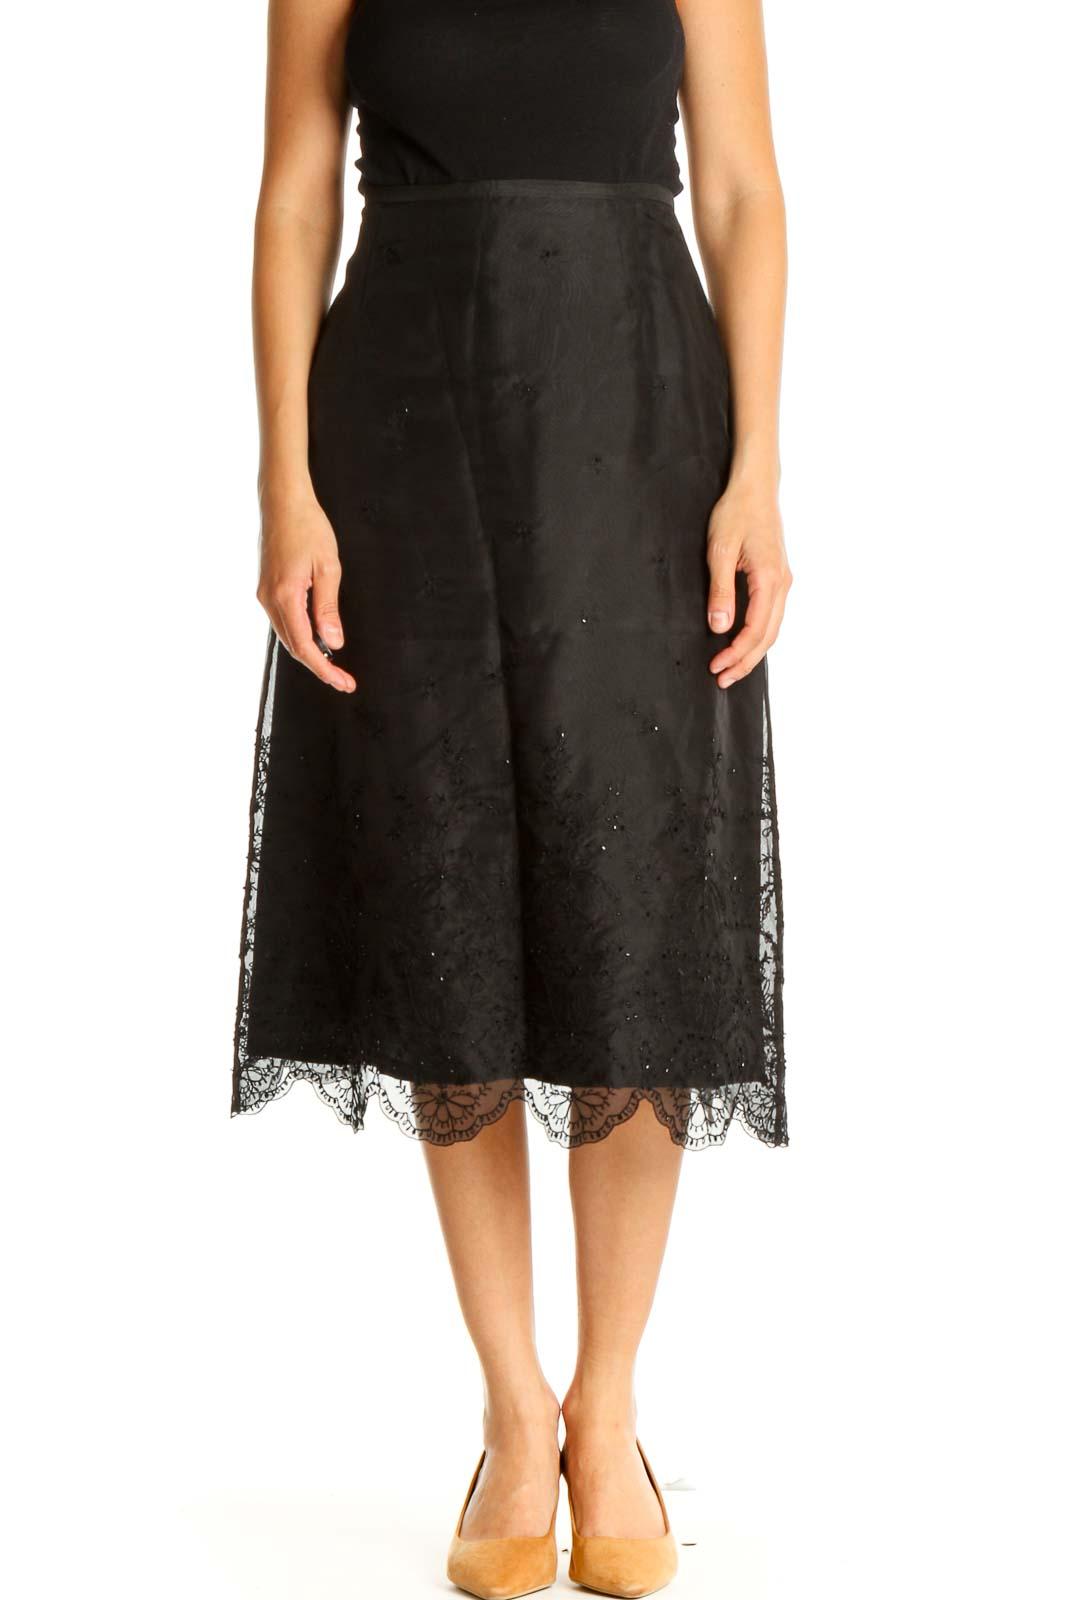 Black Sequin Retro A-Line Skirt Front